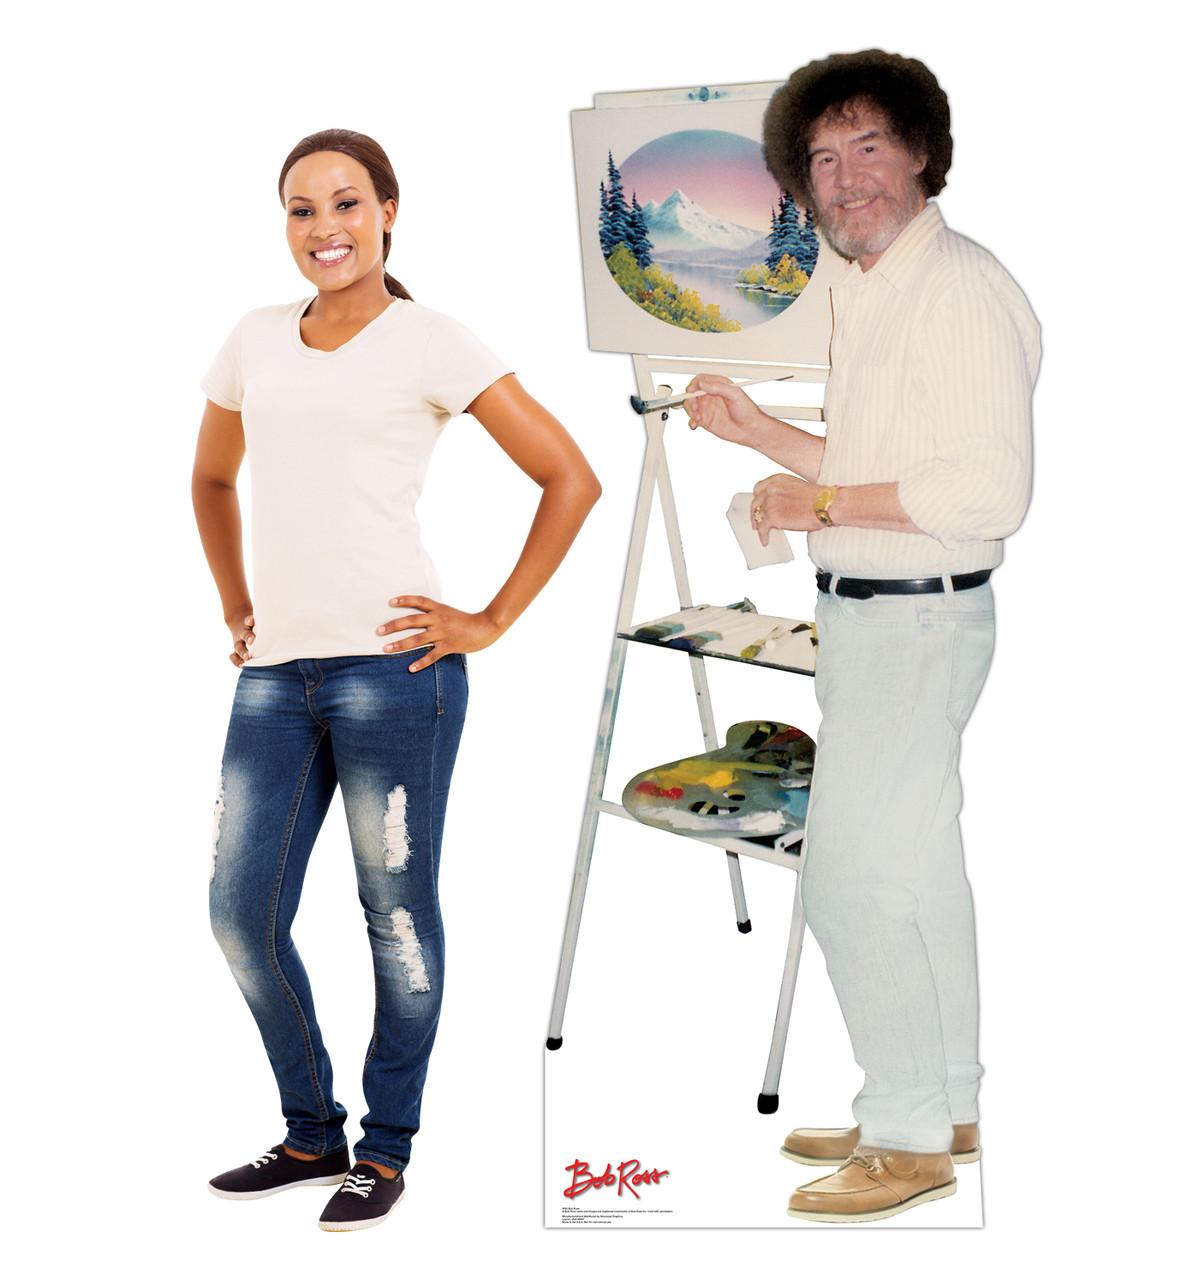 Life-size Bob Ross Talking Cardboard Standup 2